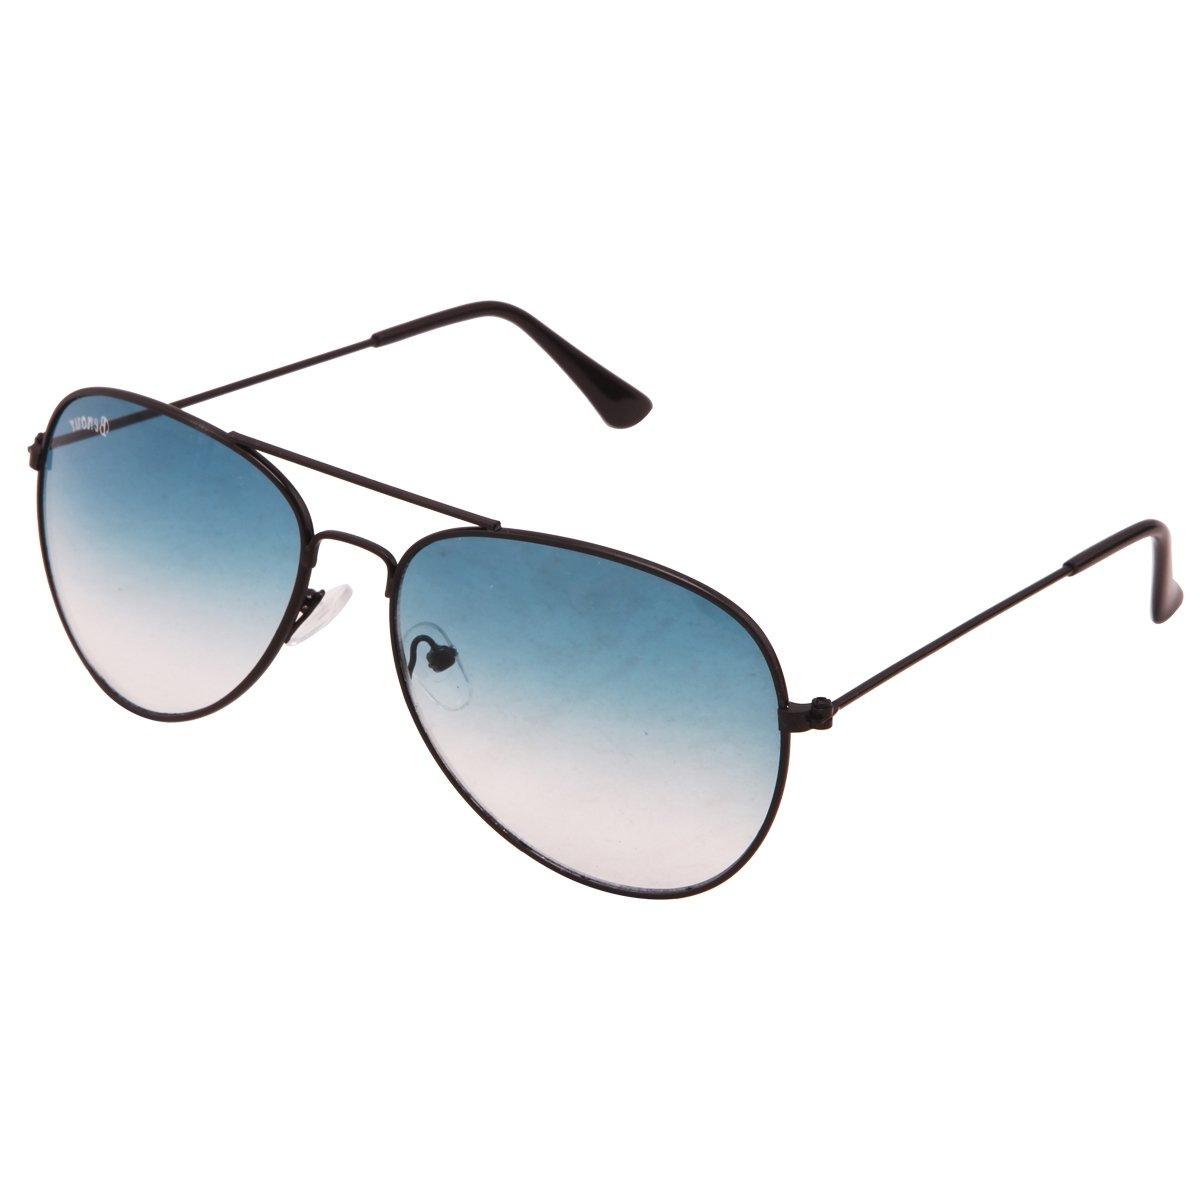 a5cafb47e69 Benour BENAV016 Black Gladiator Aviator Unisex Sunglasses  Amazon.in   Clothing   Accessories